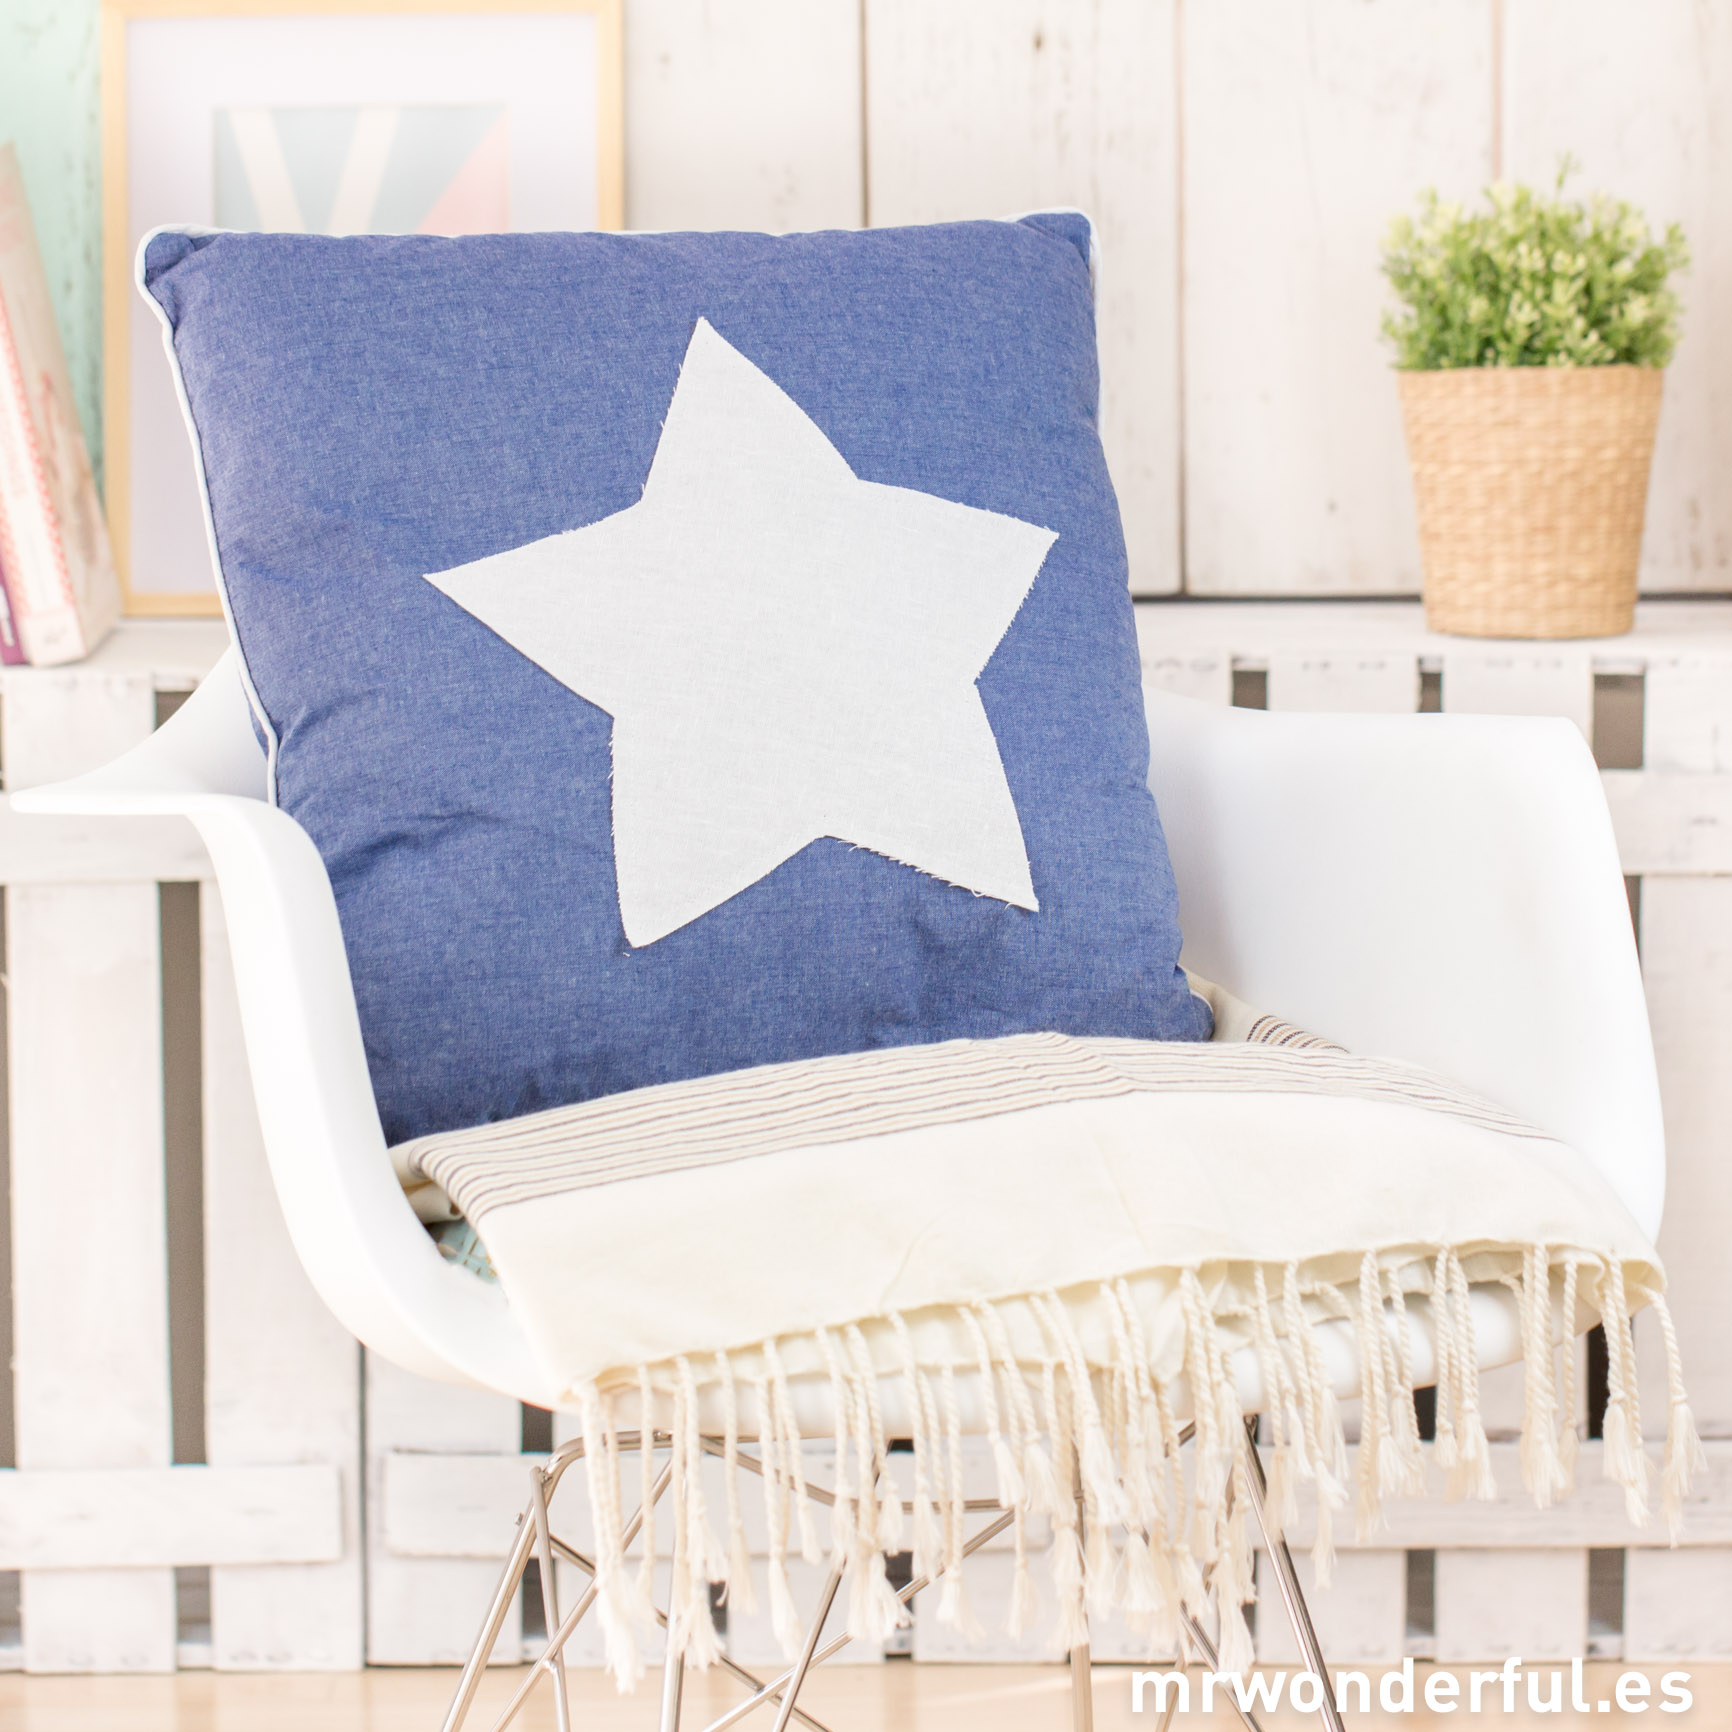 mrwonderful_52957B_cojin-cuadrado-azul-estrella-blanca-12-Editar